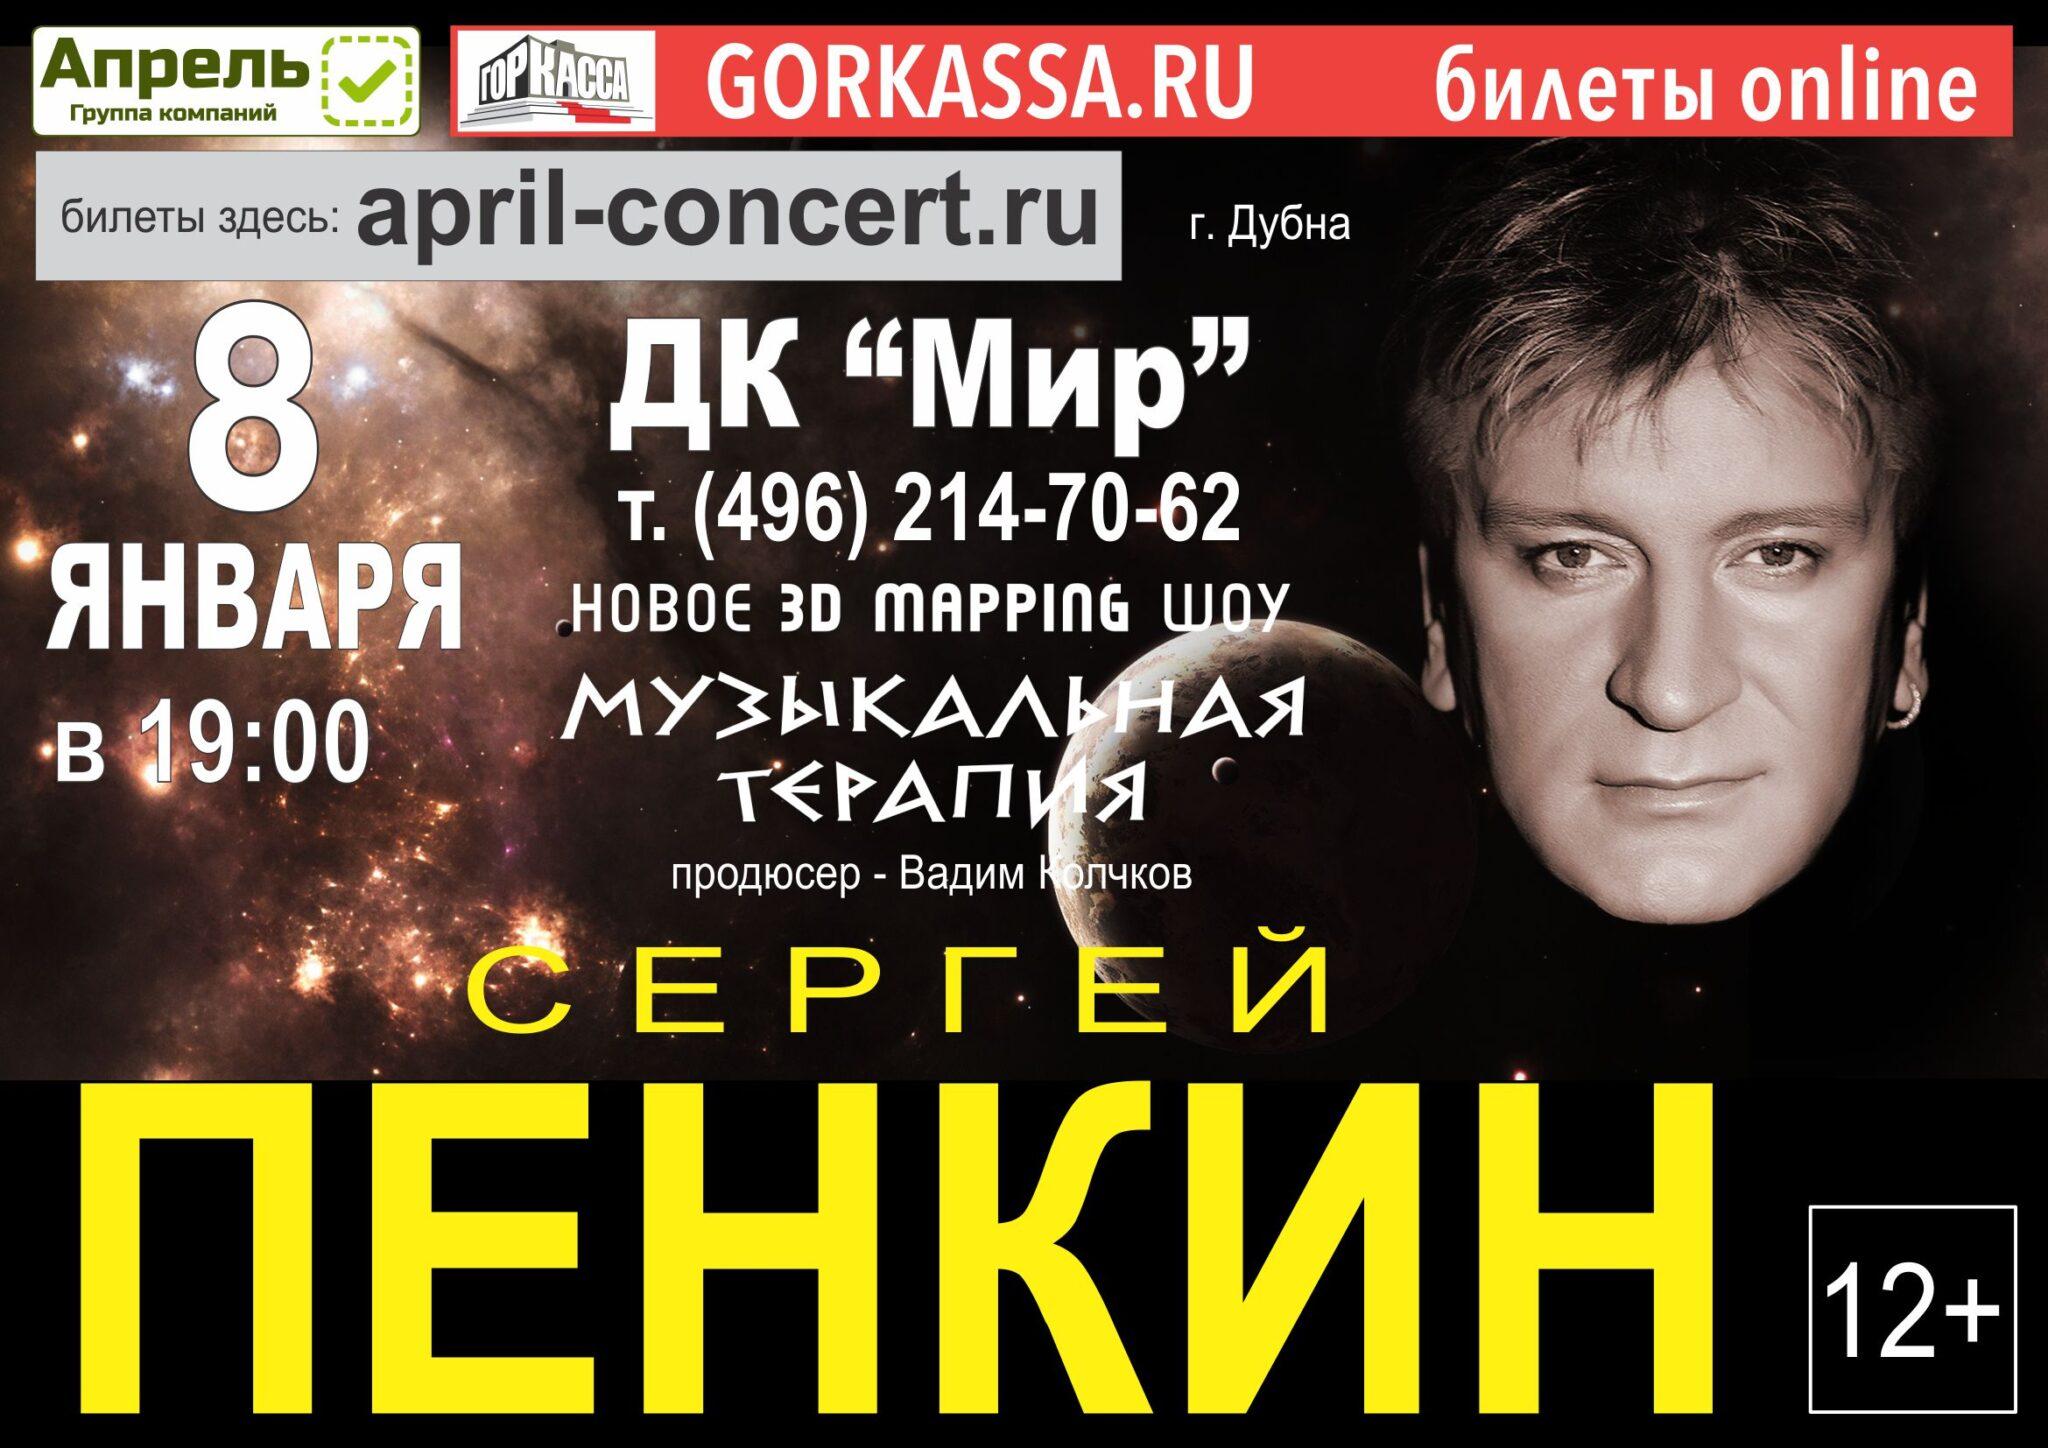 Сергей Михайлович Пенкин